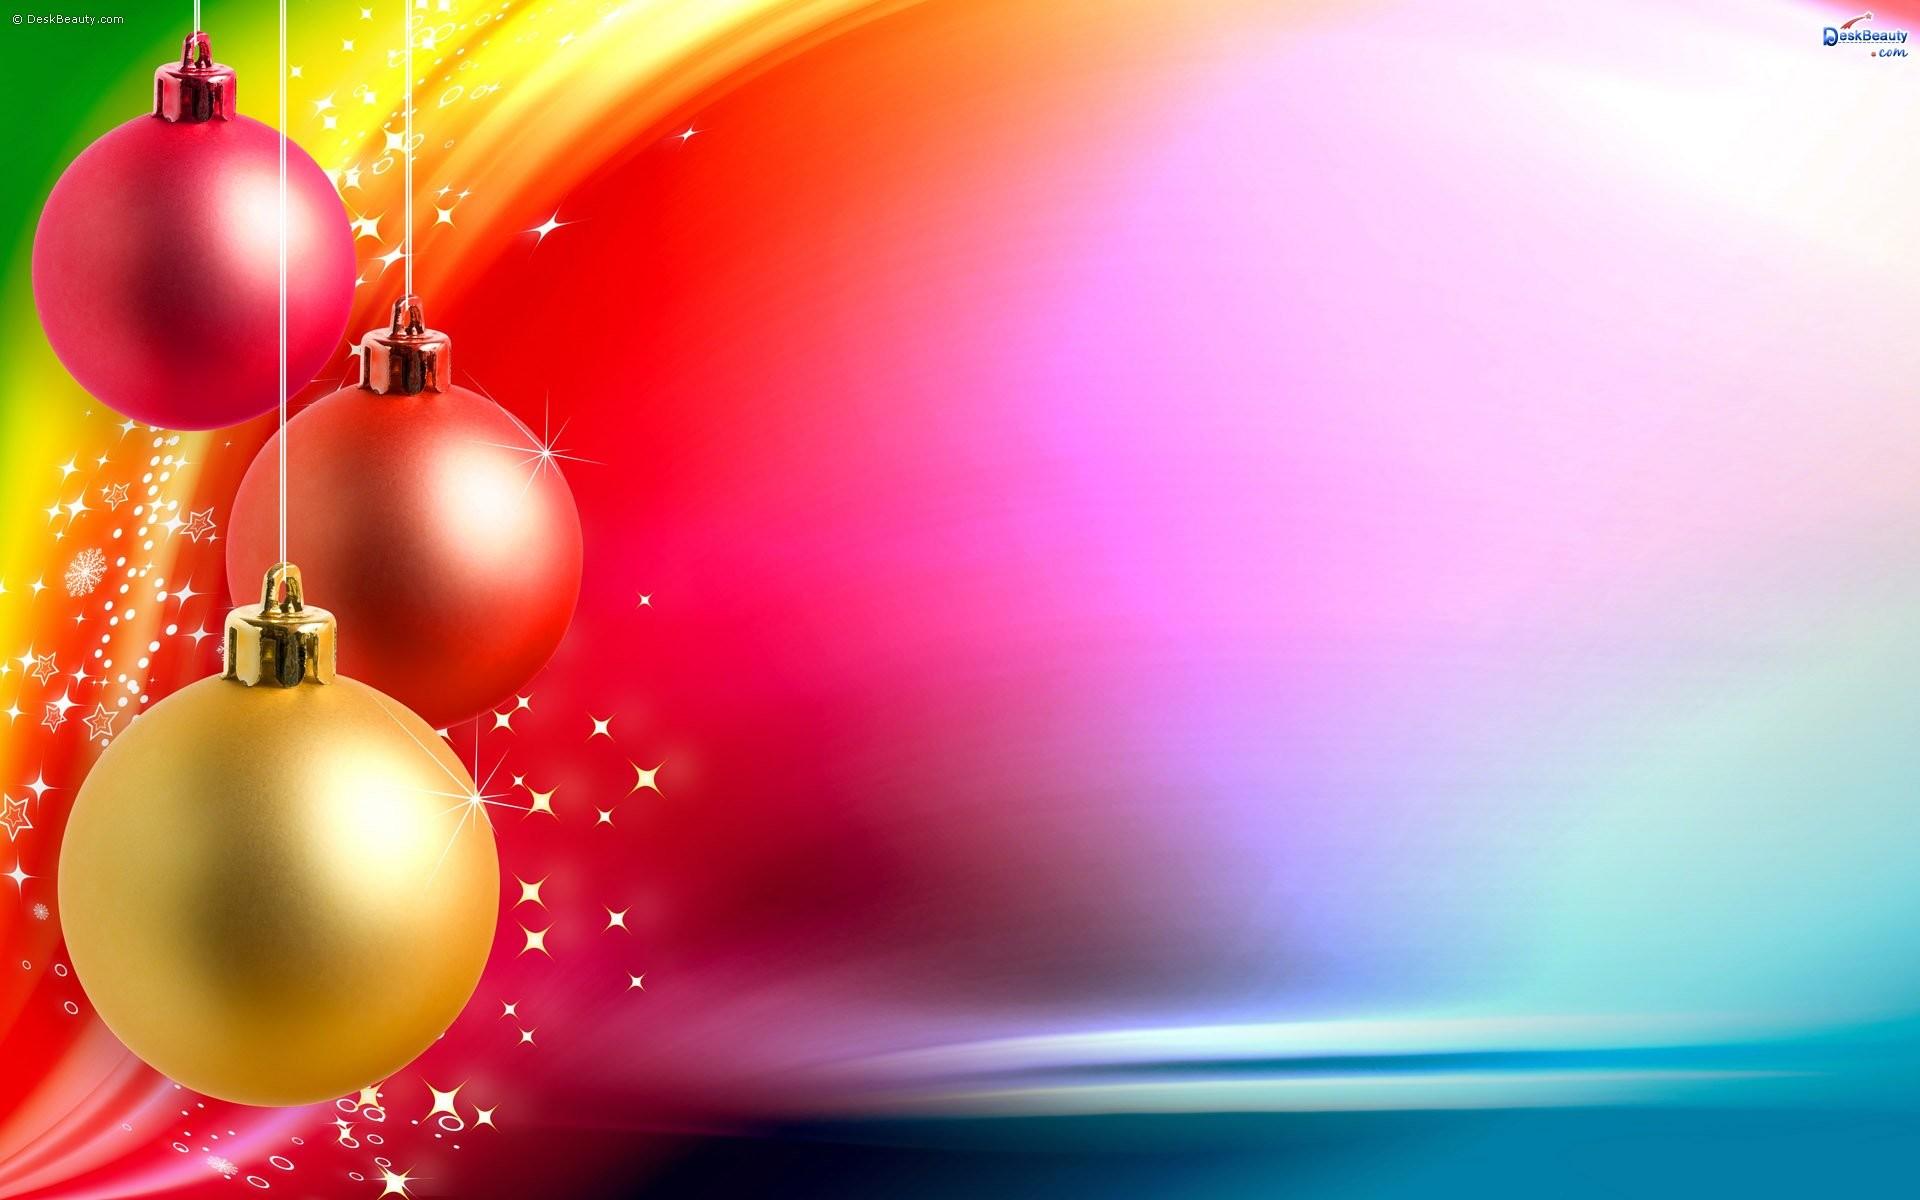 Hd Wallpaper Christmas – HD Wallpapers Pretty